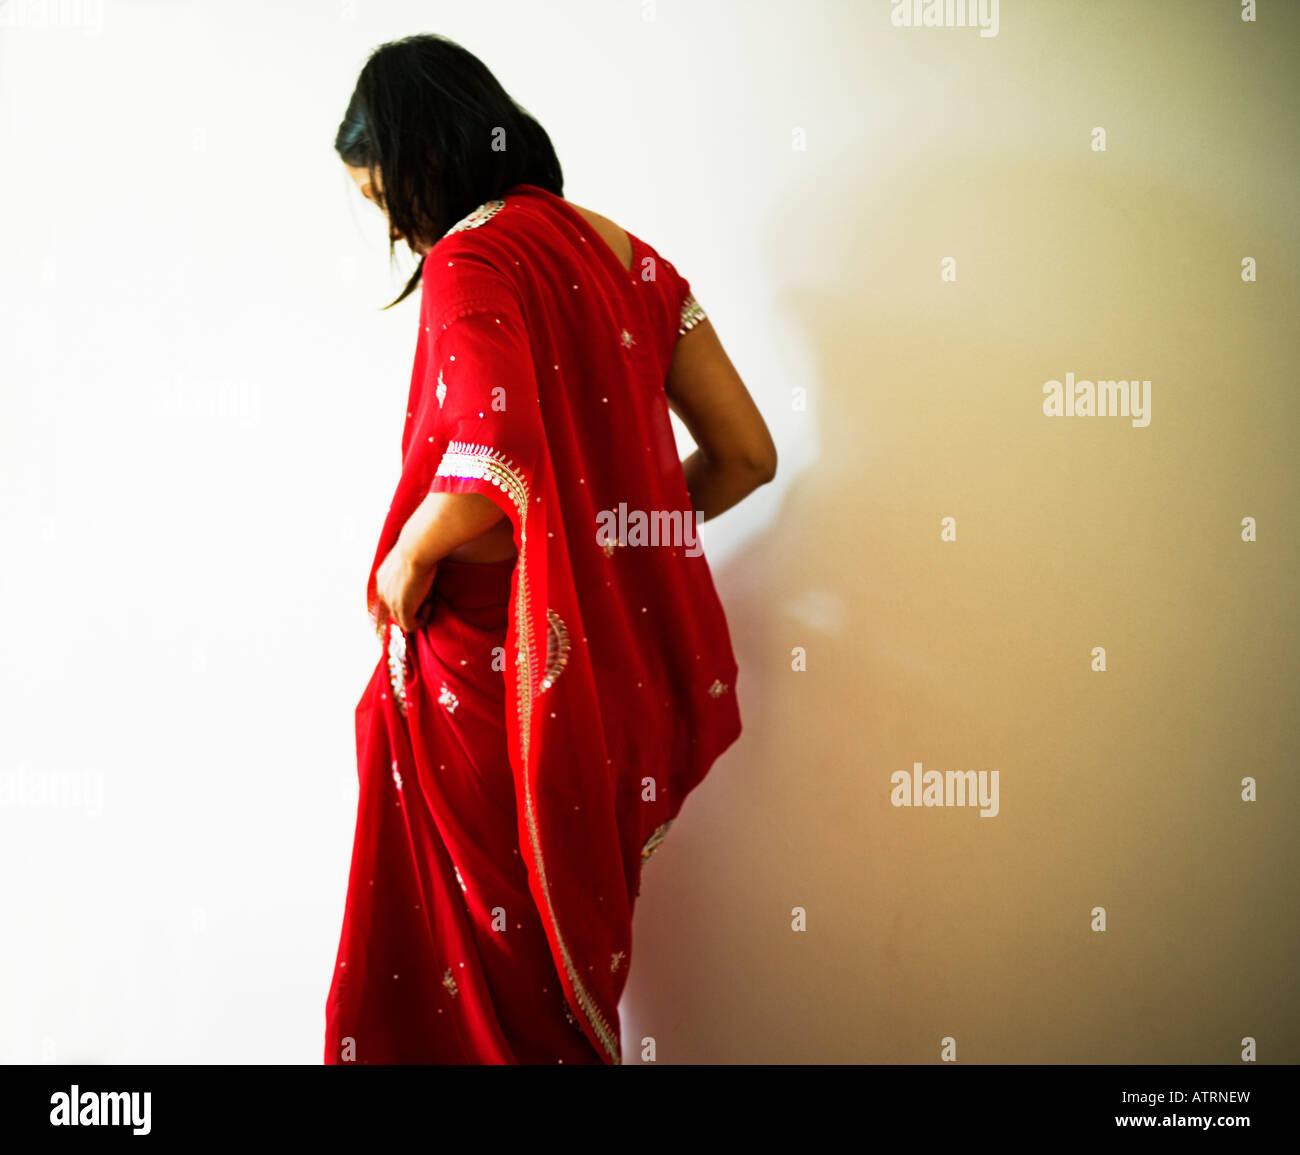 Woman in red sari - Stock Image